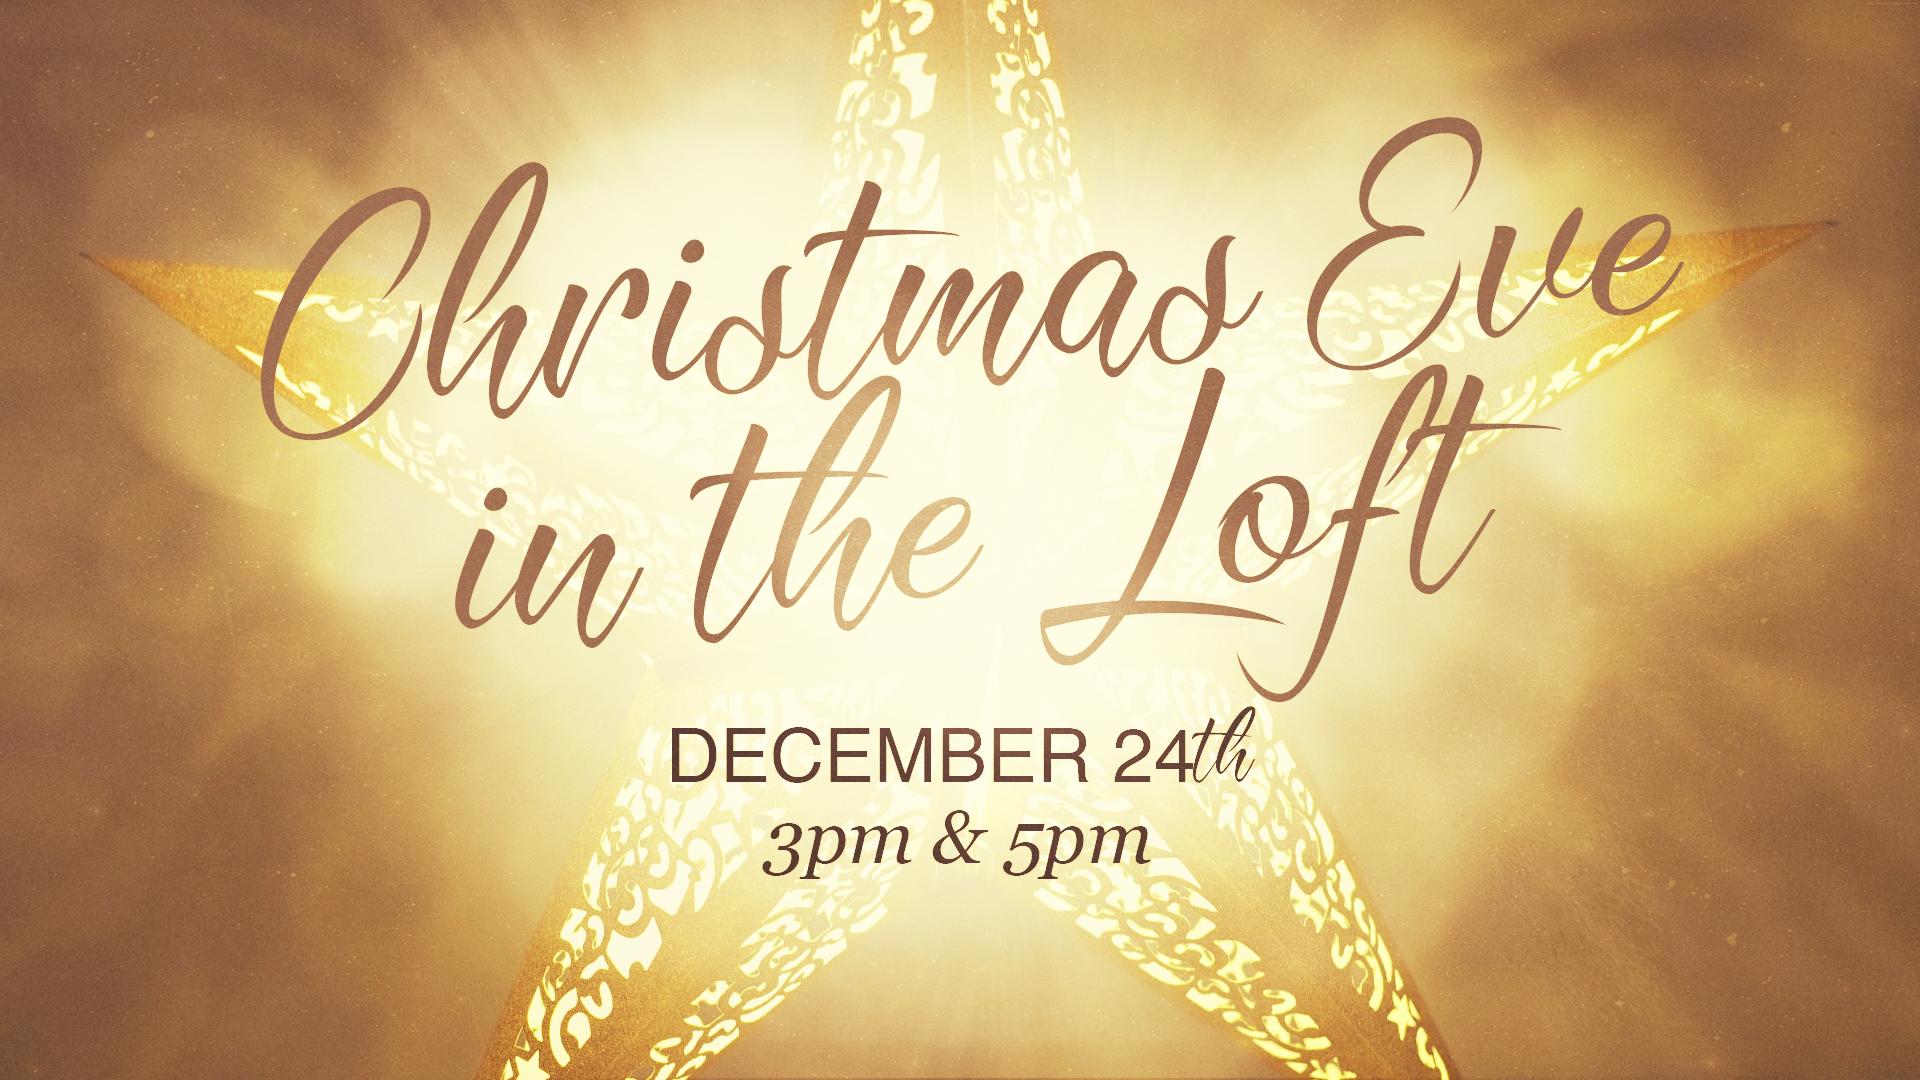 Christmas Eve in the Loft - Cornwall Church